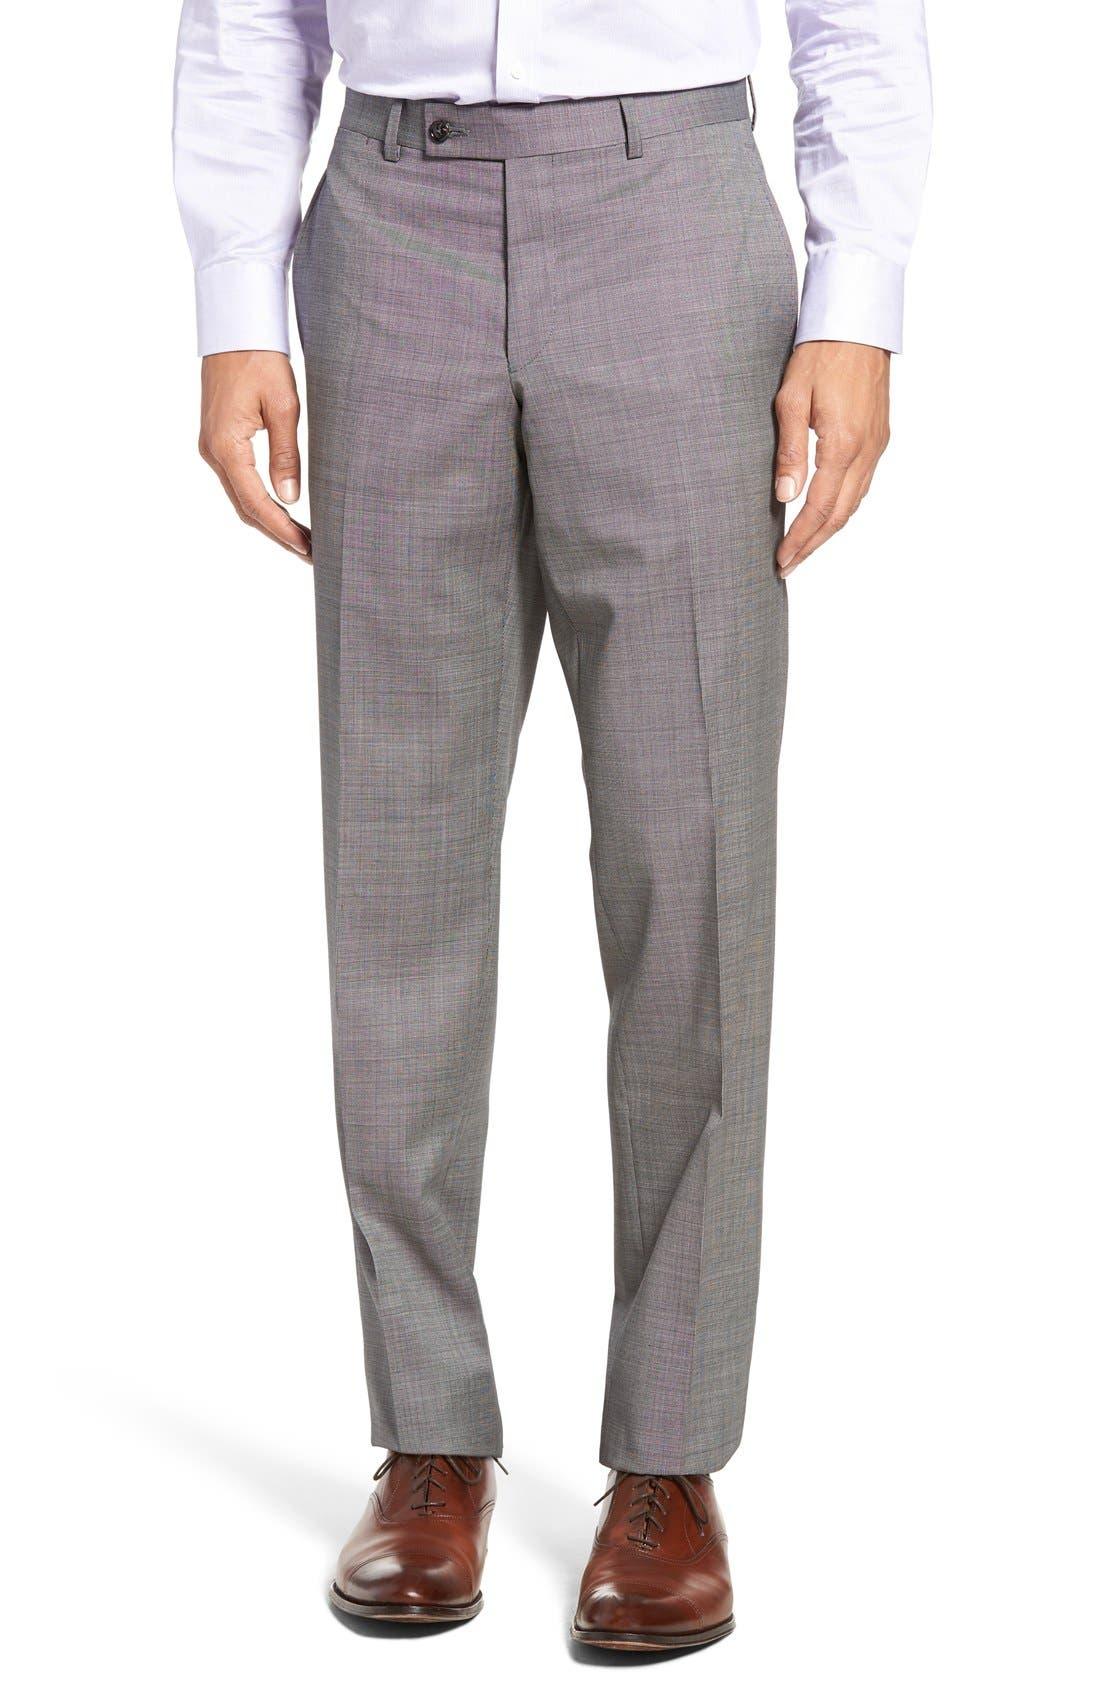 Jay Trim Fit Solid Wool Suit,                             Alternate thumbnail 14, color,                             LIGHT GREY